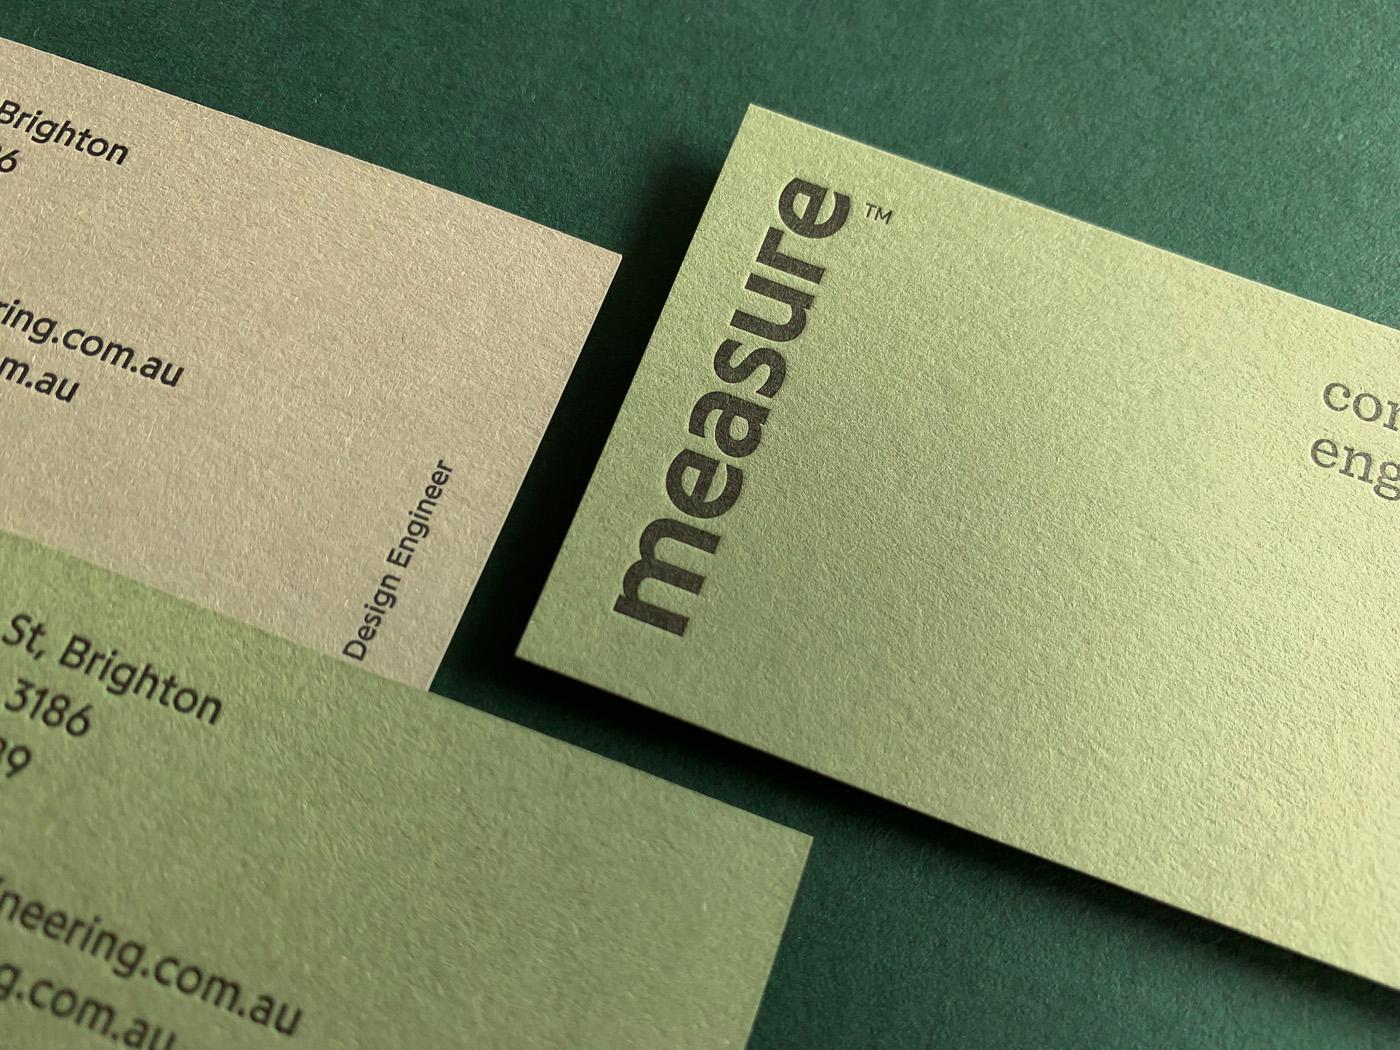 Letterpress Business Card for Measure on Stephen 2